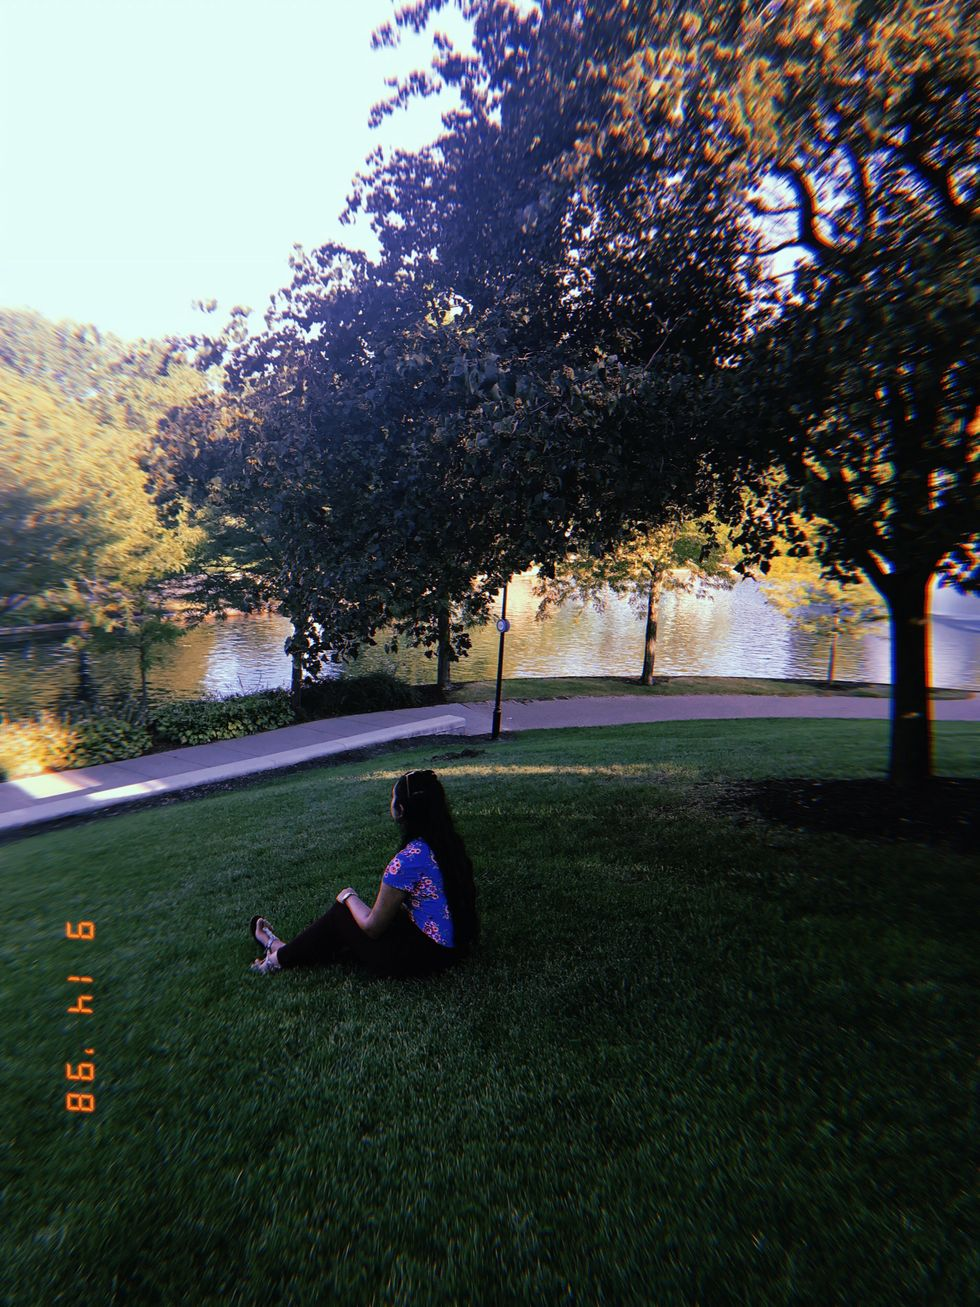 10 Ways Huji Brightens Up My Pictures